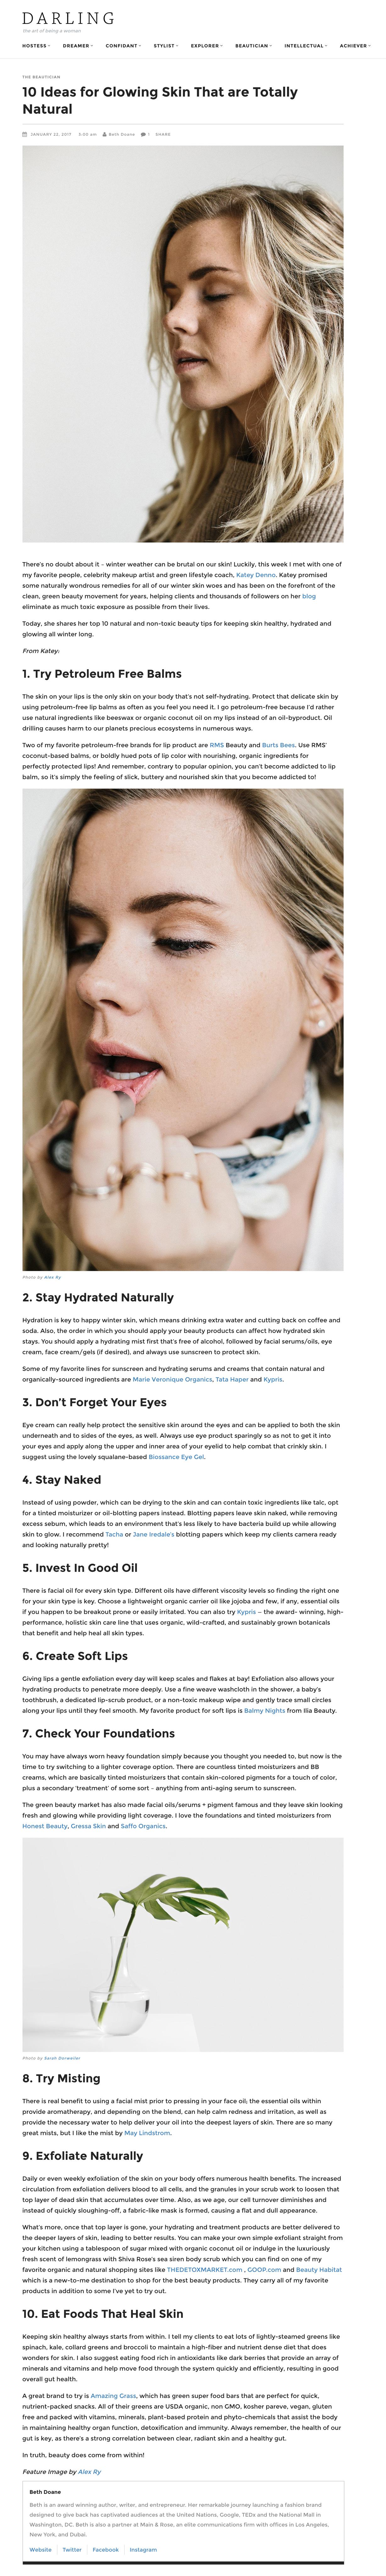 darlingmagazine-10-ideas-glowing-skin-totally-natural-.jpg